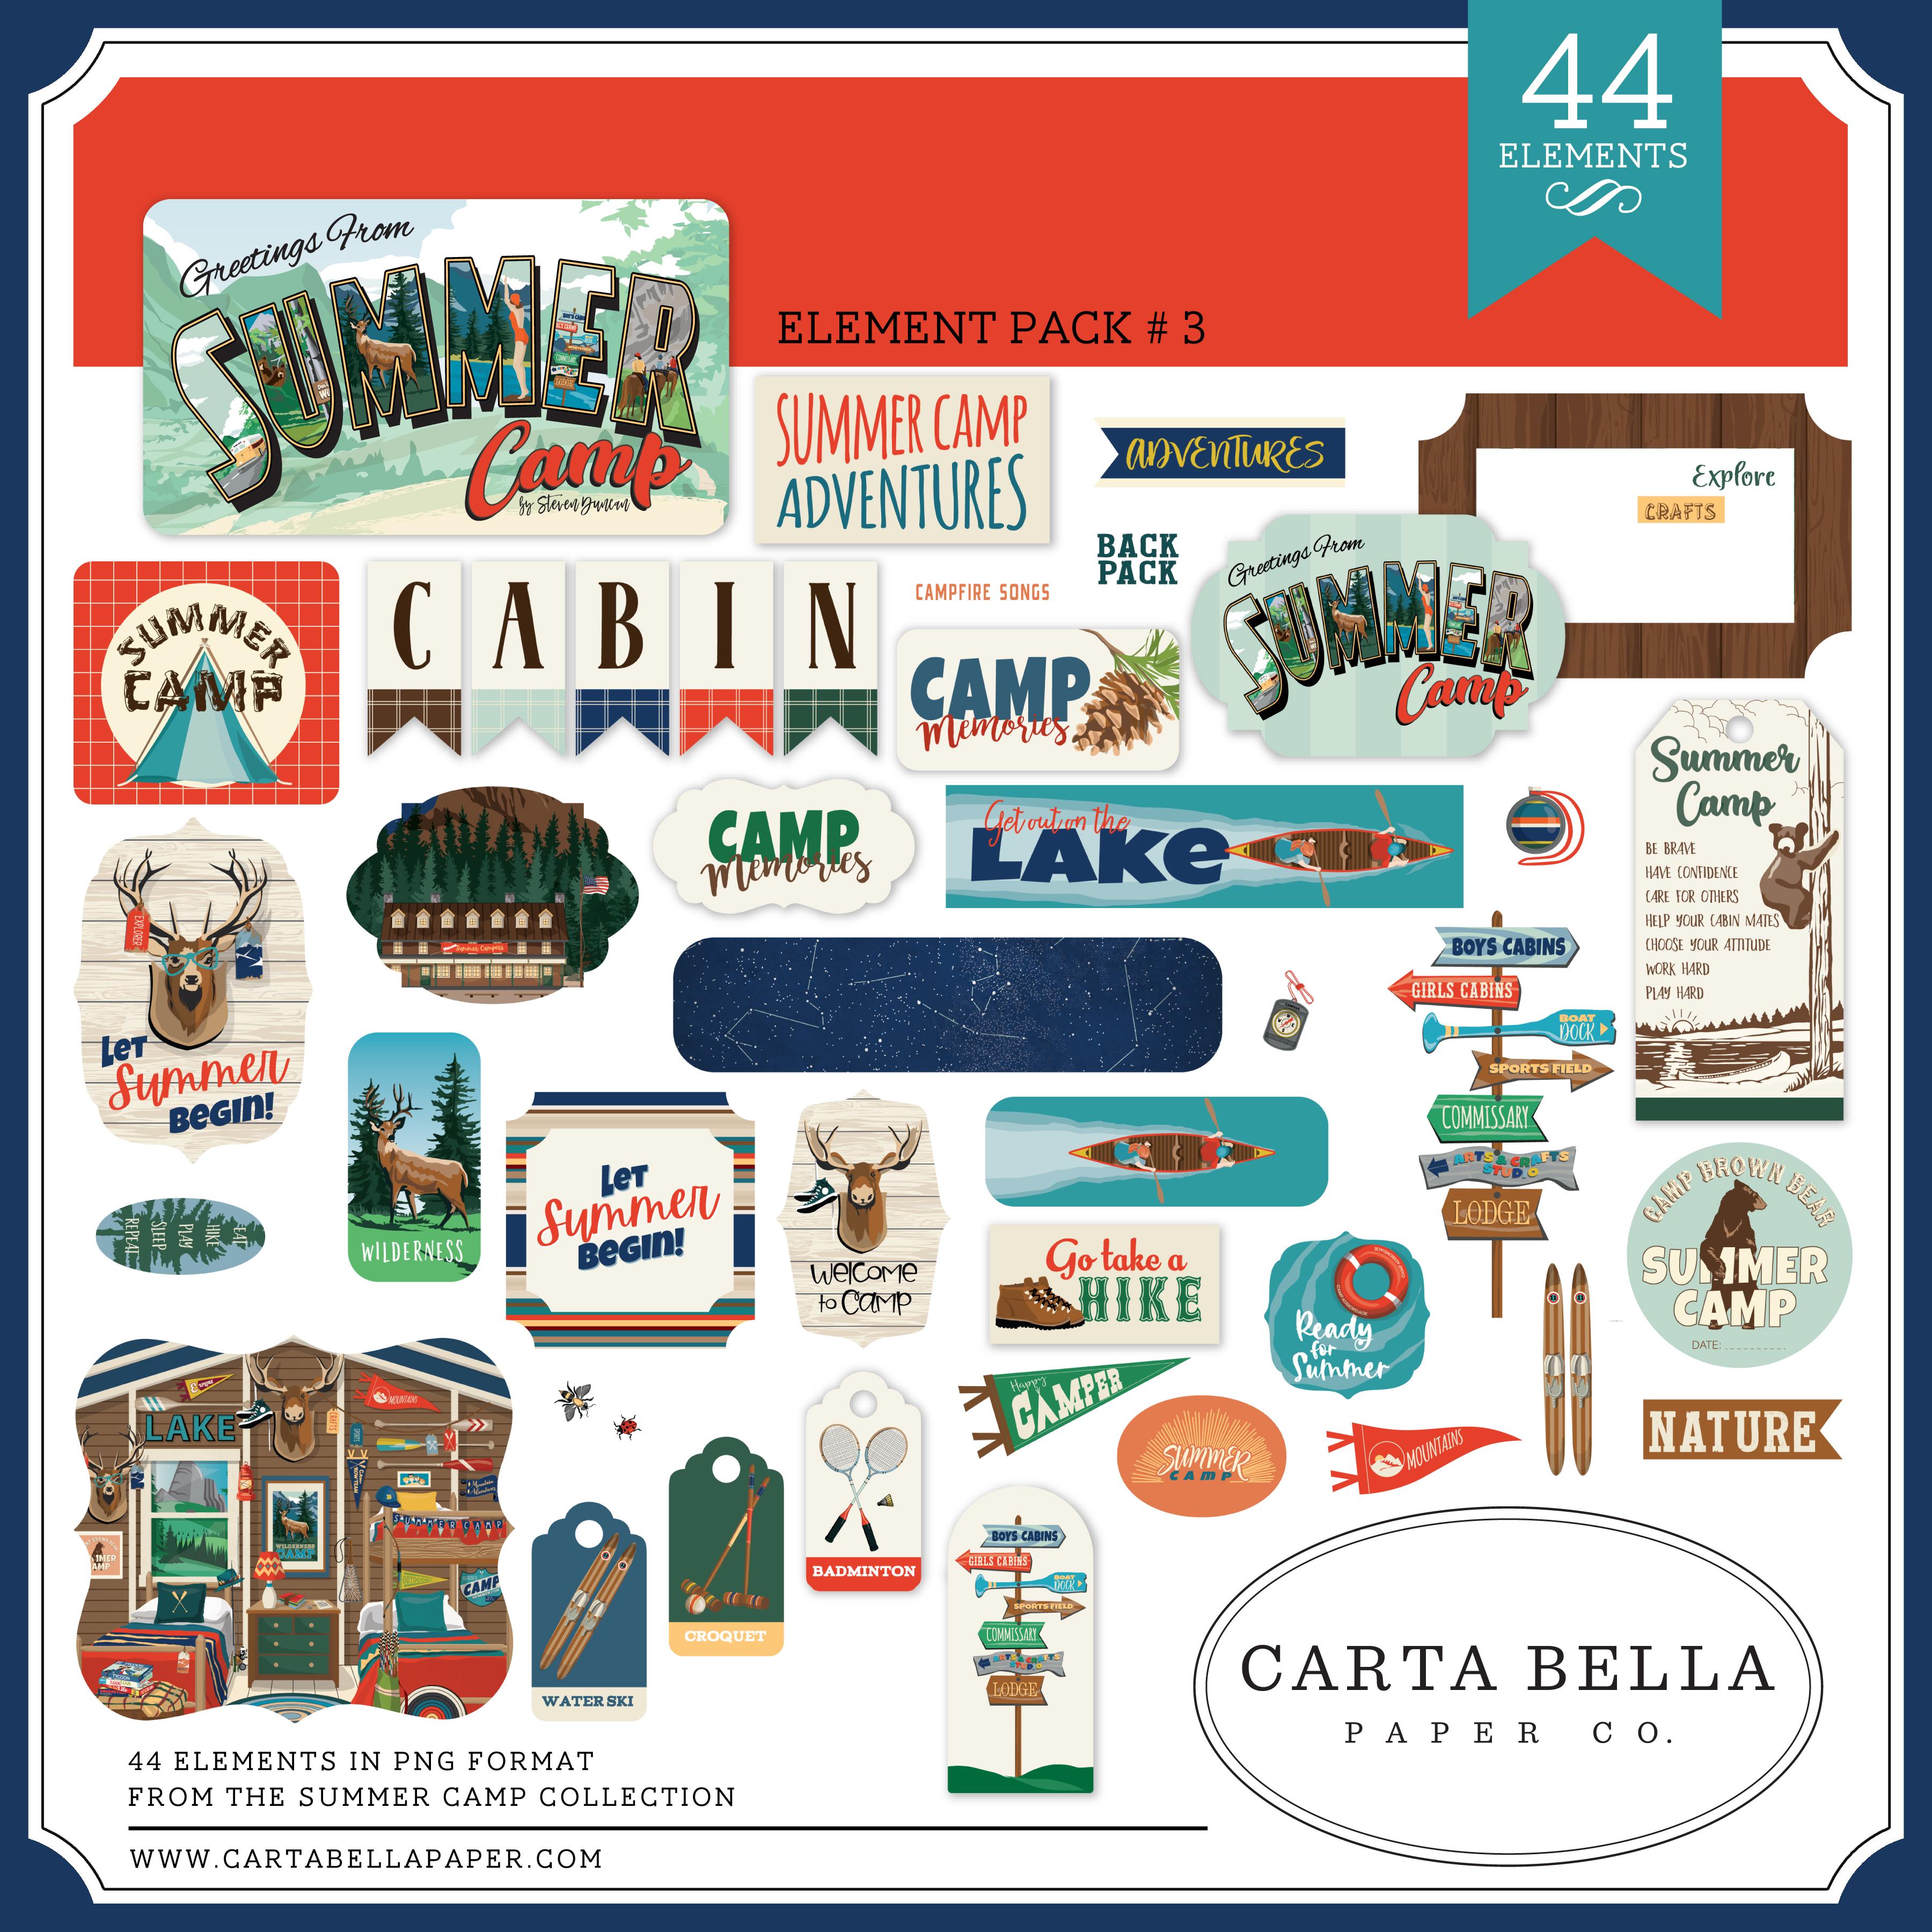 Summer Camp Element Pack #3